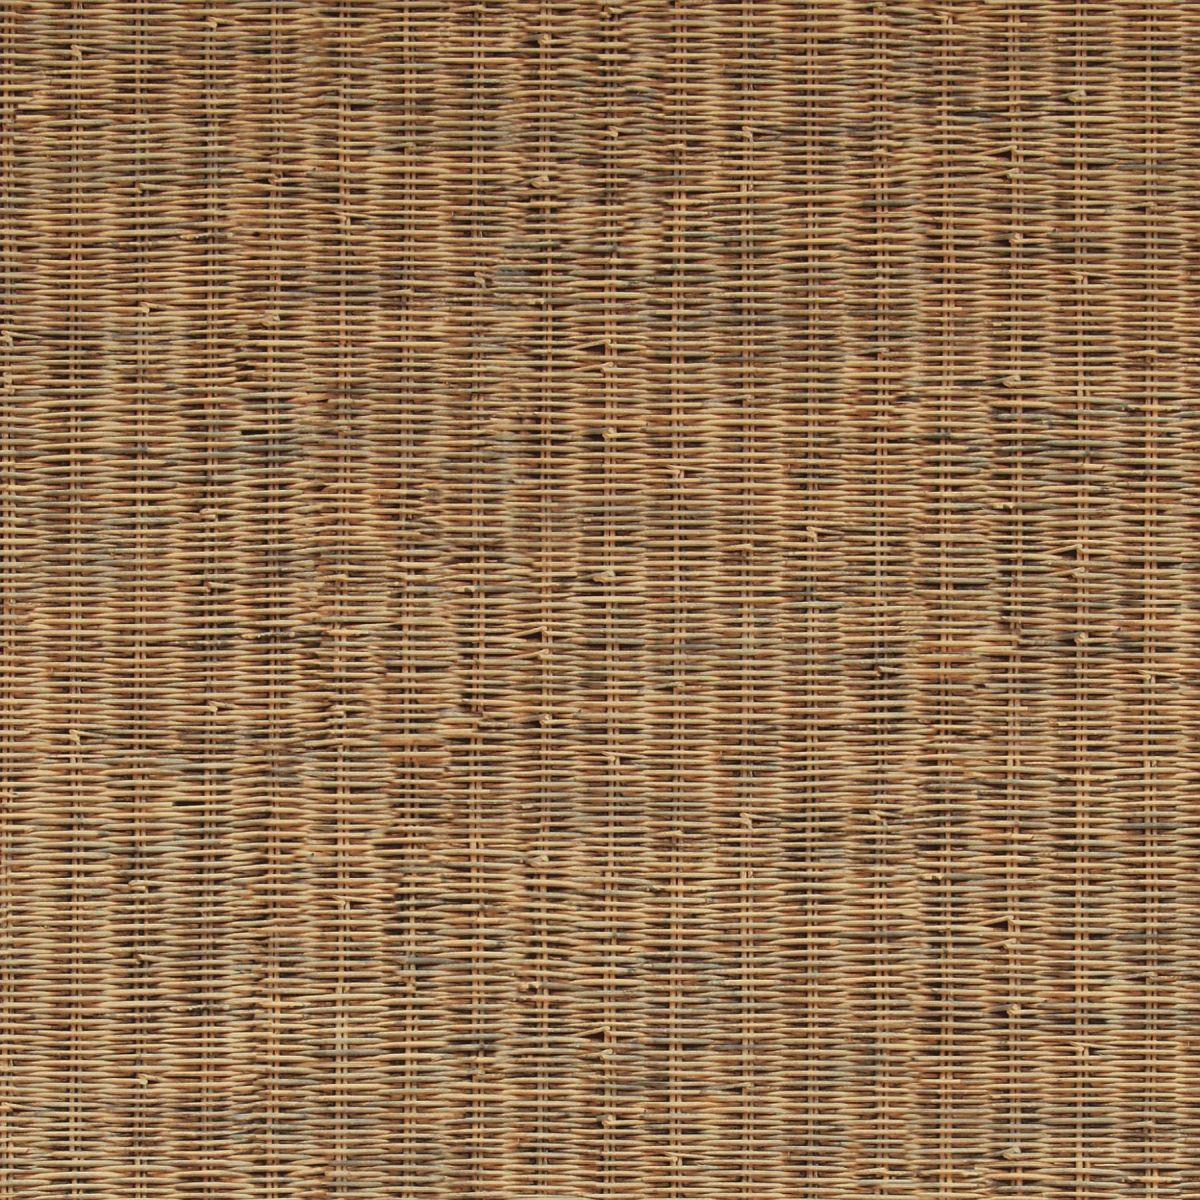 hochwertige tapeten und stoffe b n wallcoverings vliestapete riviera maison 18334 decowunder. Black Bedroom Furniture Sets. Home Design Ideas